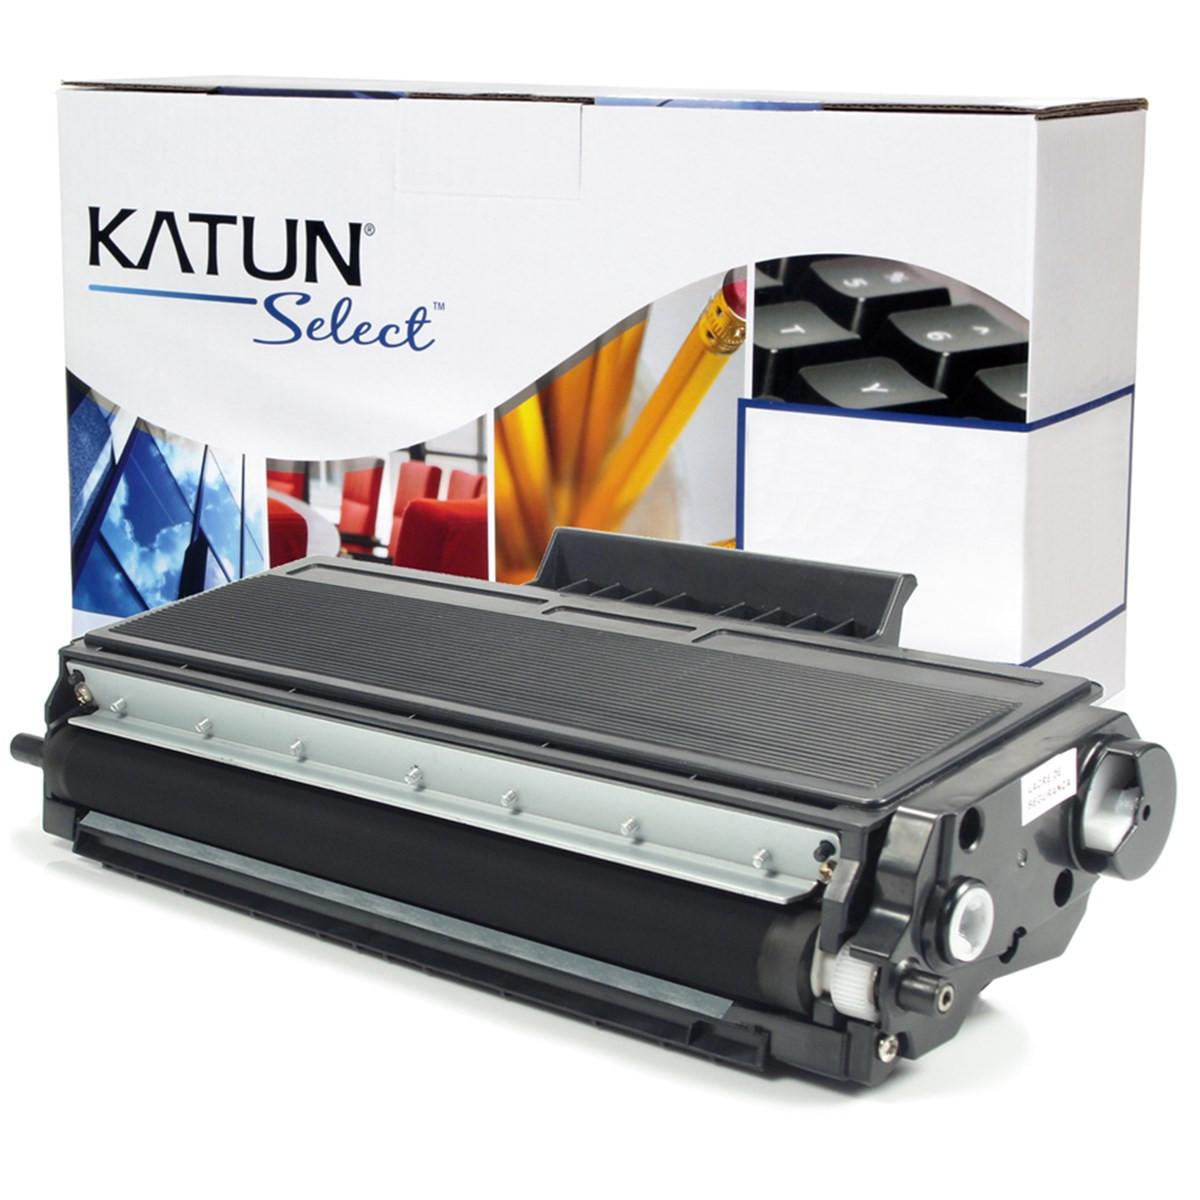 Toner Compatível com Brother TN580 | DCP8060 HL5240 MFC8460N MFC8860DN | Katun Select 8k